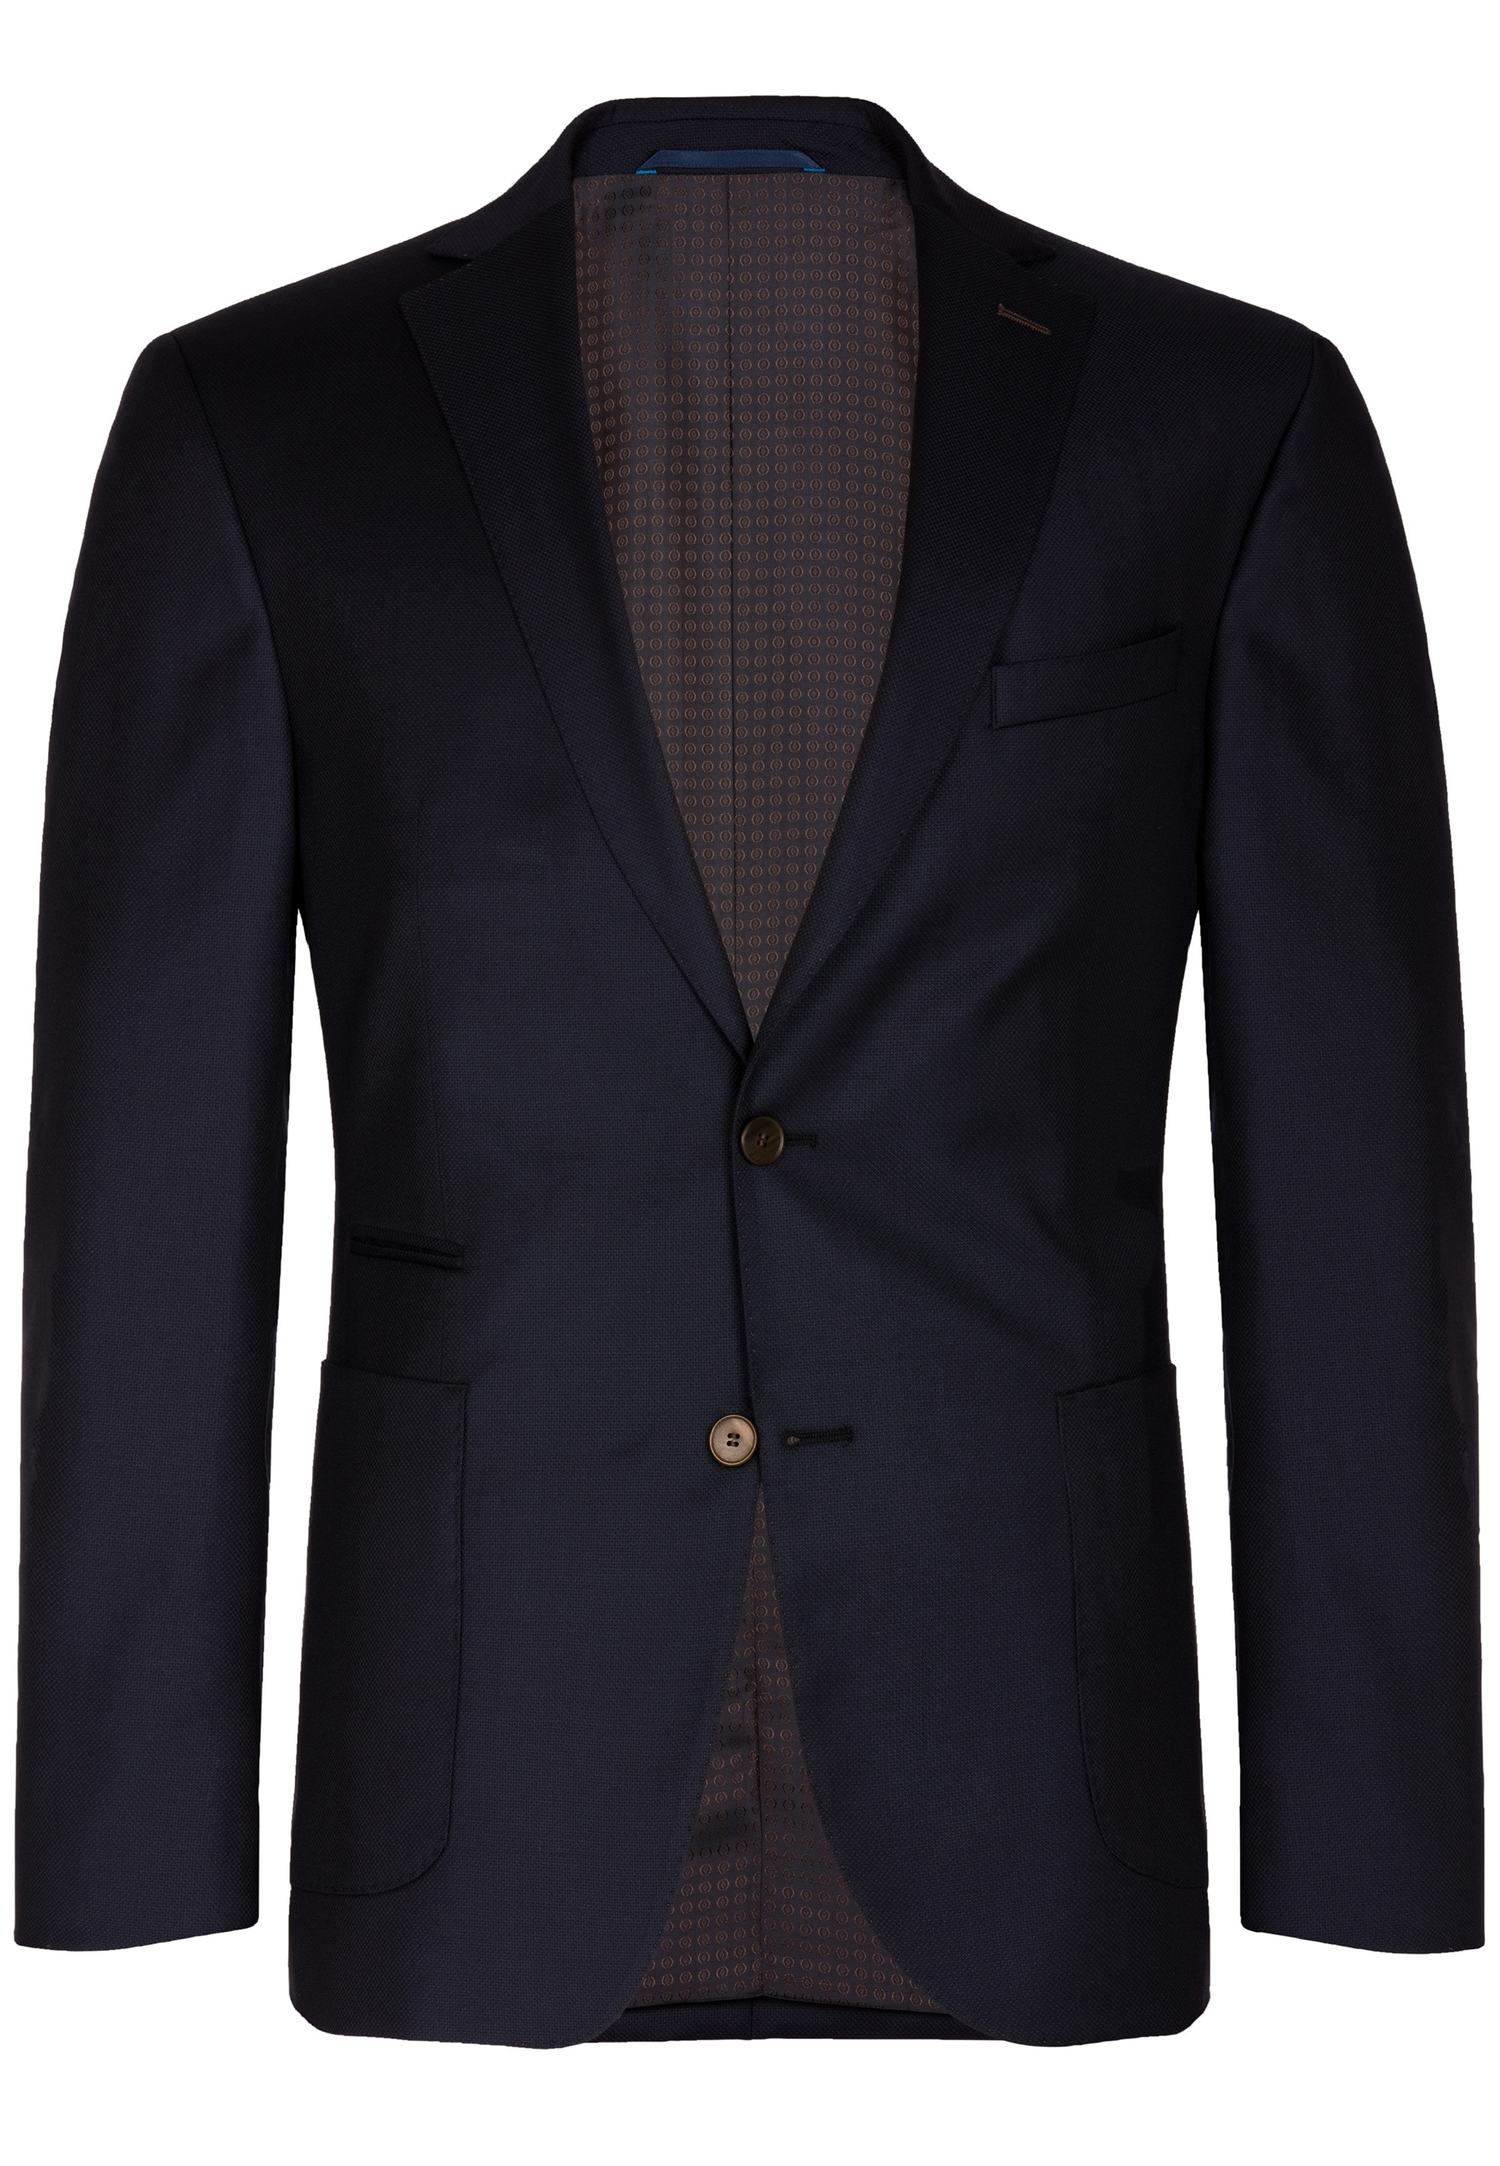 CARL GROSS Blazer »CG Fairbanks« | Bekleidung > Sakkos > Sonstige Sakkos | Blau | Schurwolle - Viskose | CARL GROSS